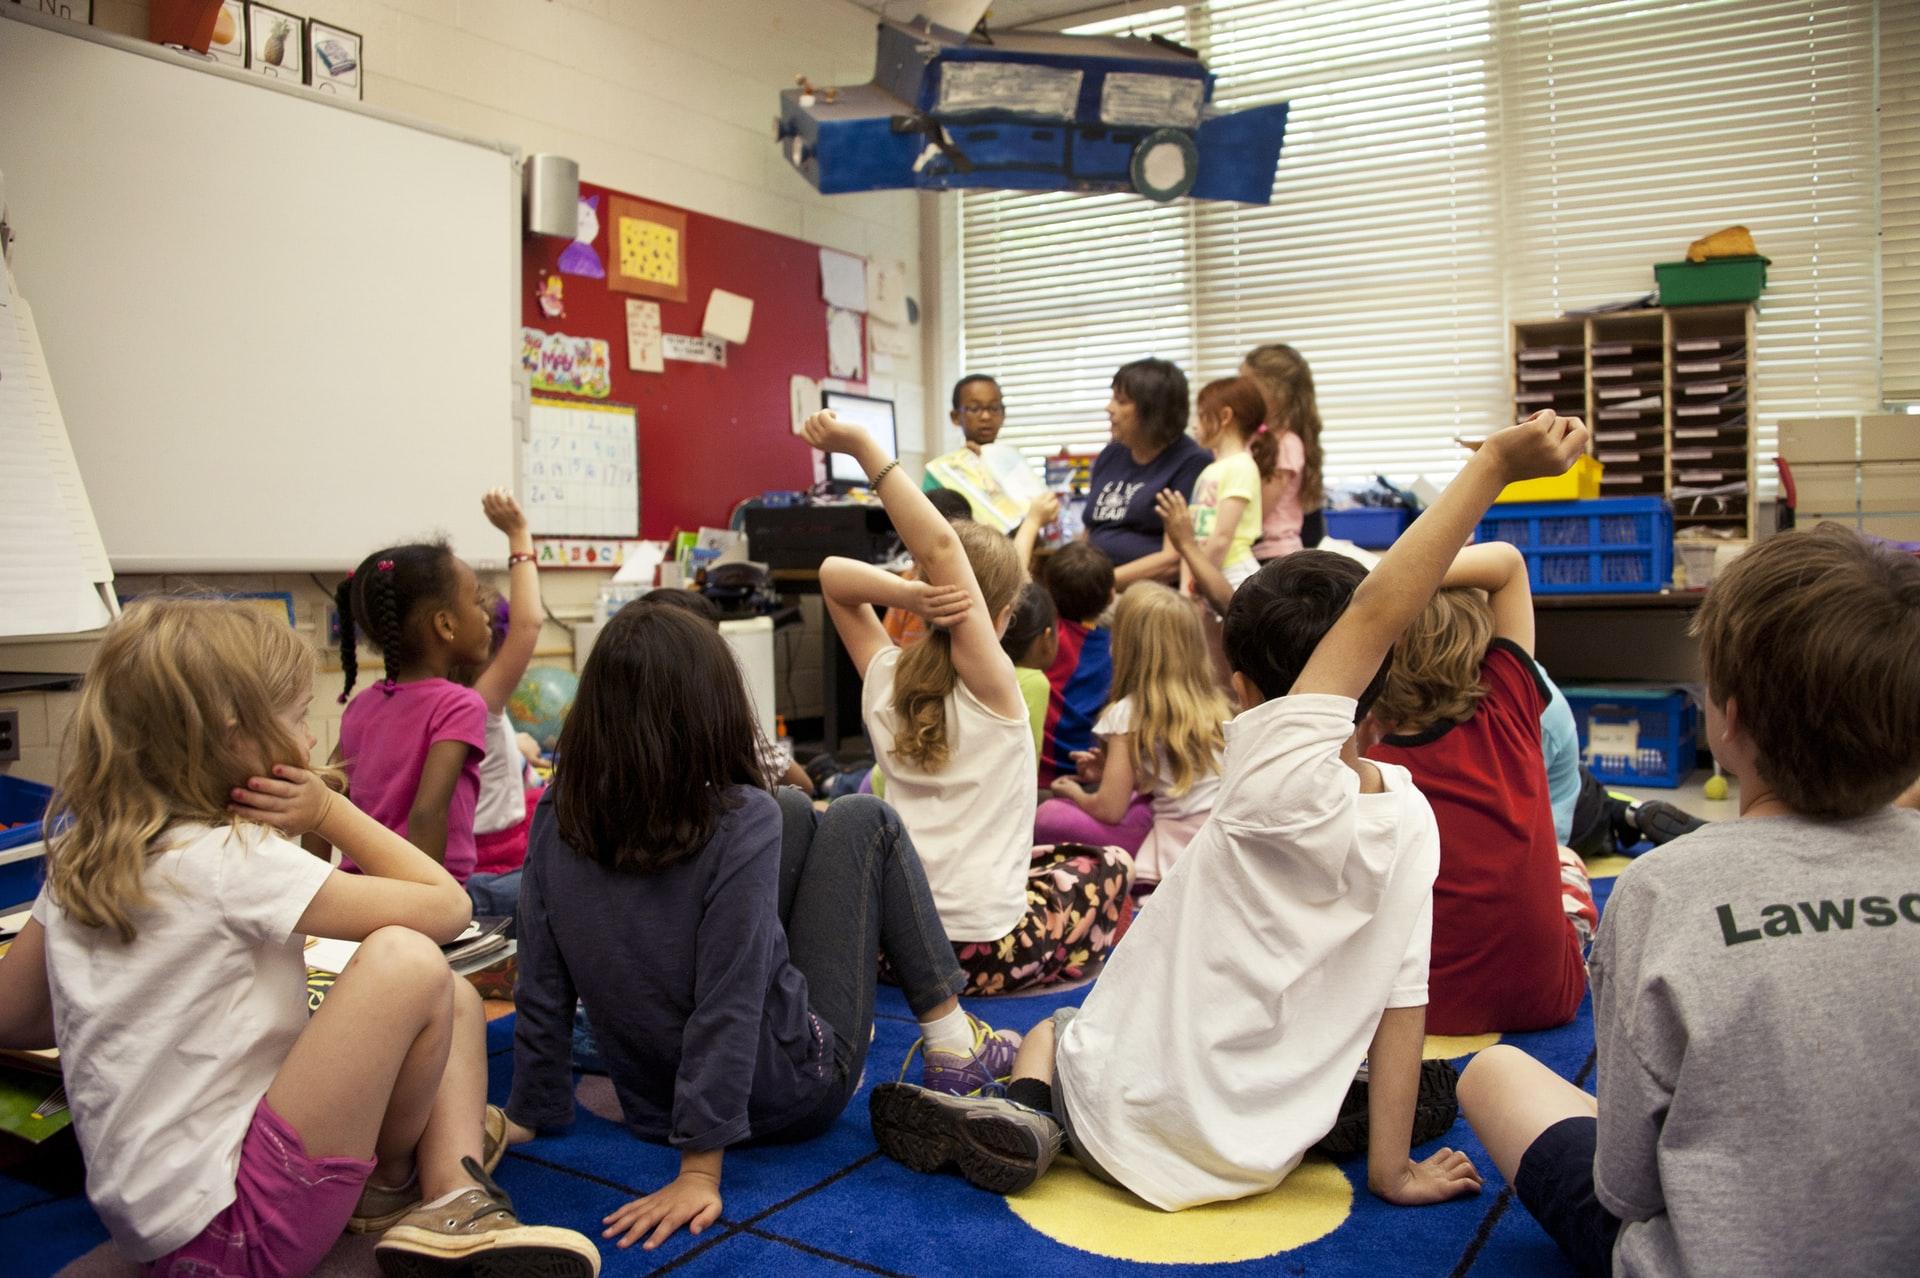 preschoolers raising their hands in a classroom